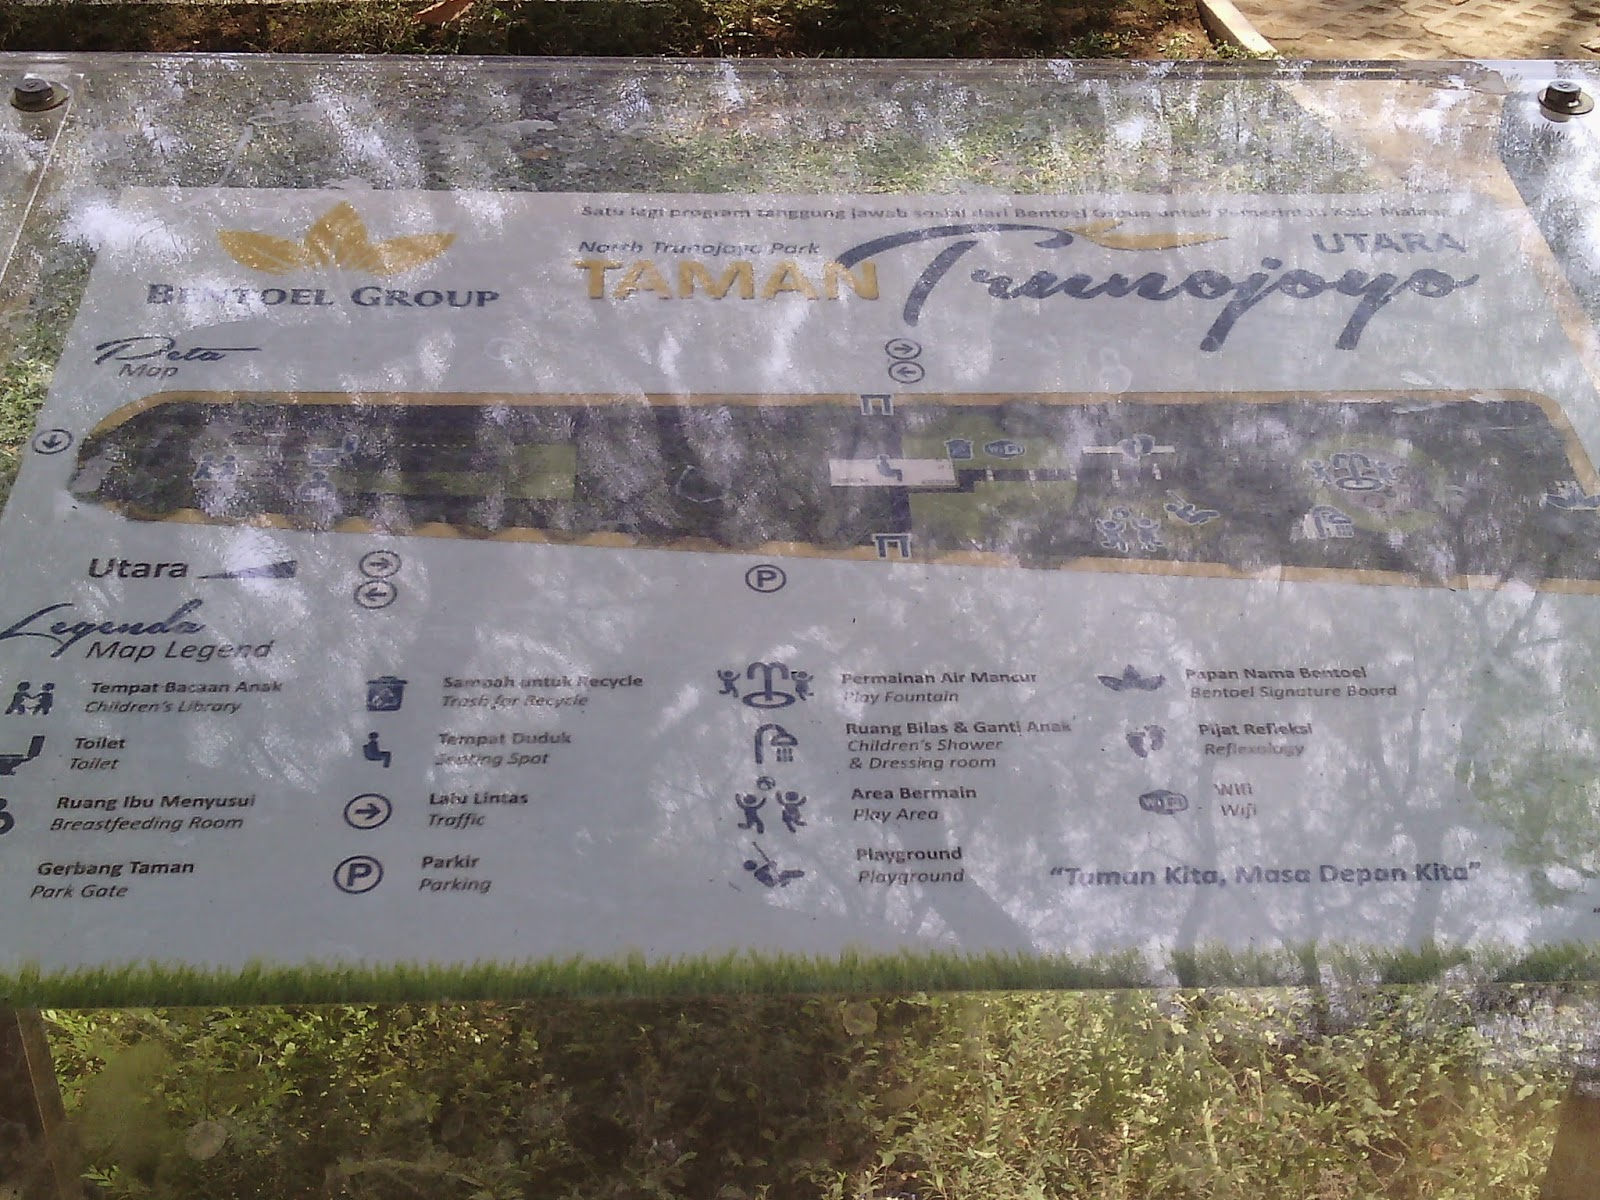 Arsitektur Landscape Taman Bentoel Trunojoyo Kota Malang Denah Lokasi Bagian